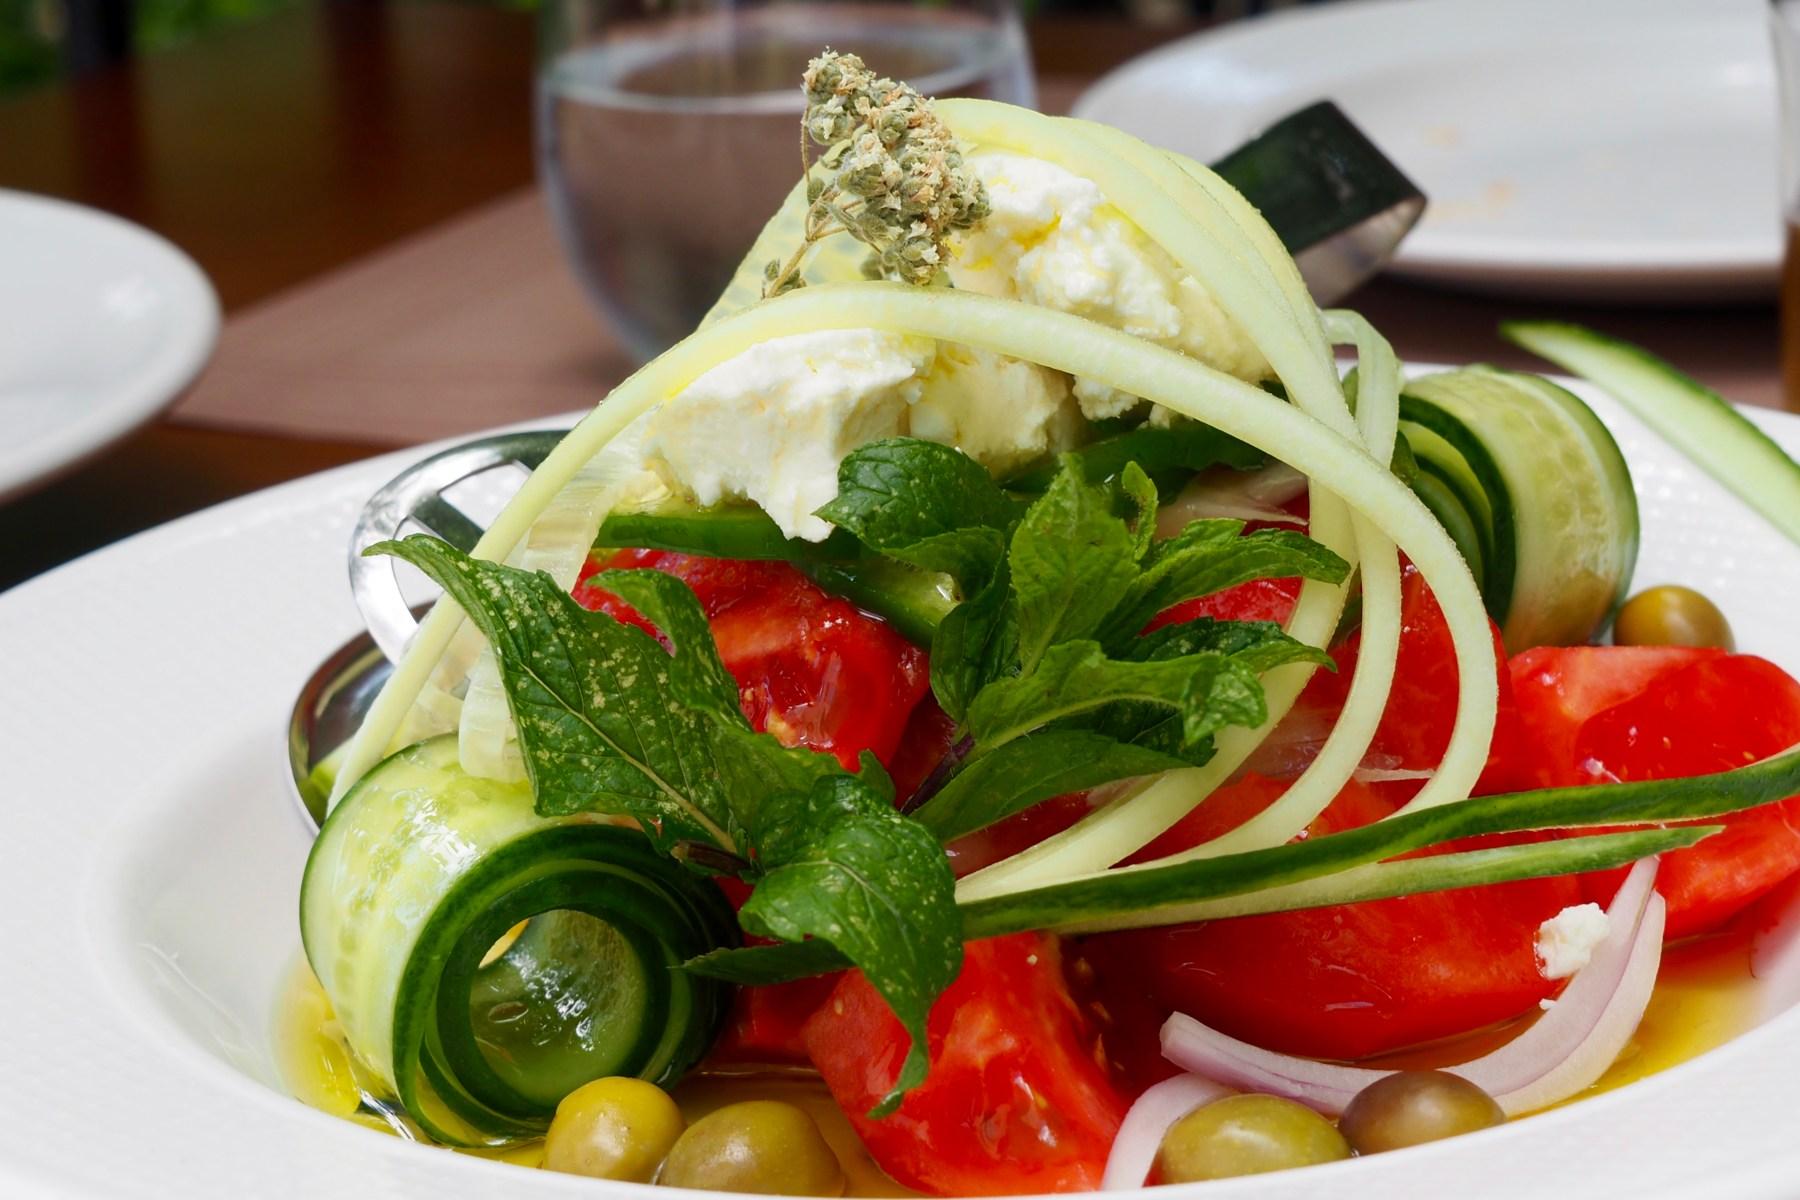 Lunch at Lefteris Taverna, Naxos, Greece